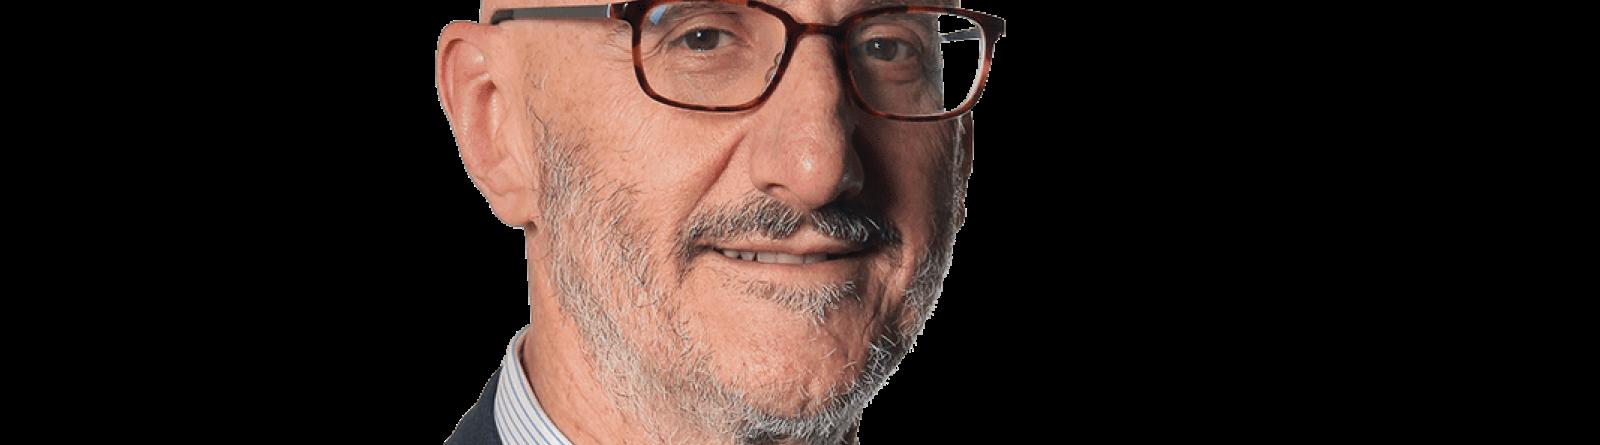 Francesco Caio, nuovo senior advisor di Gimme5